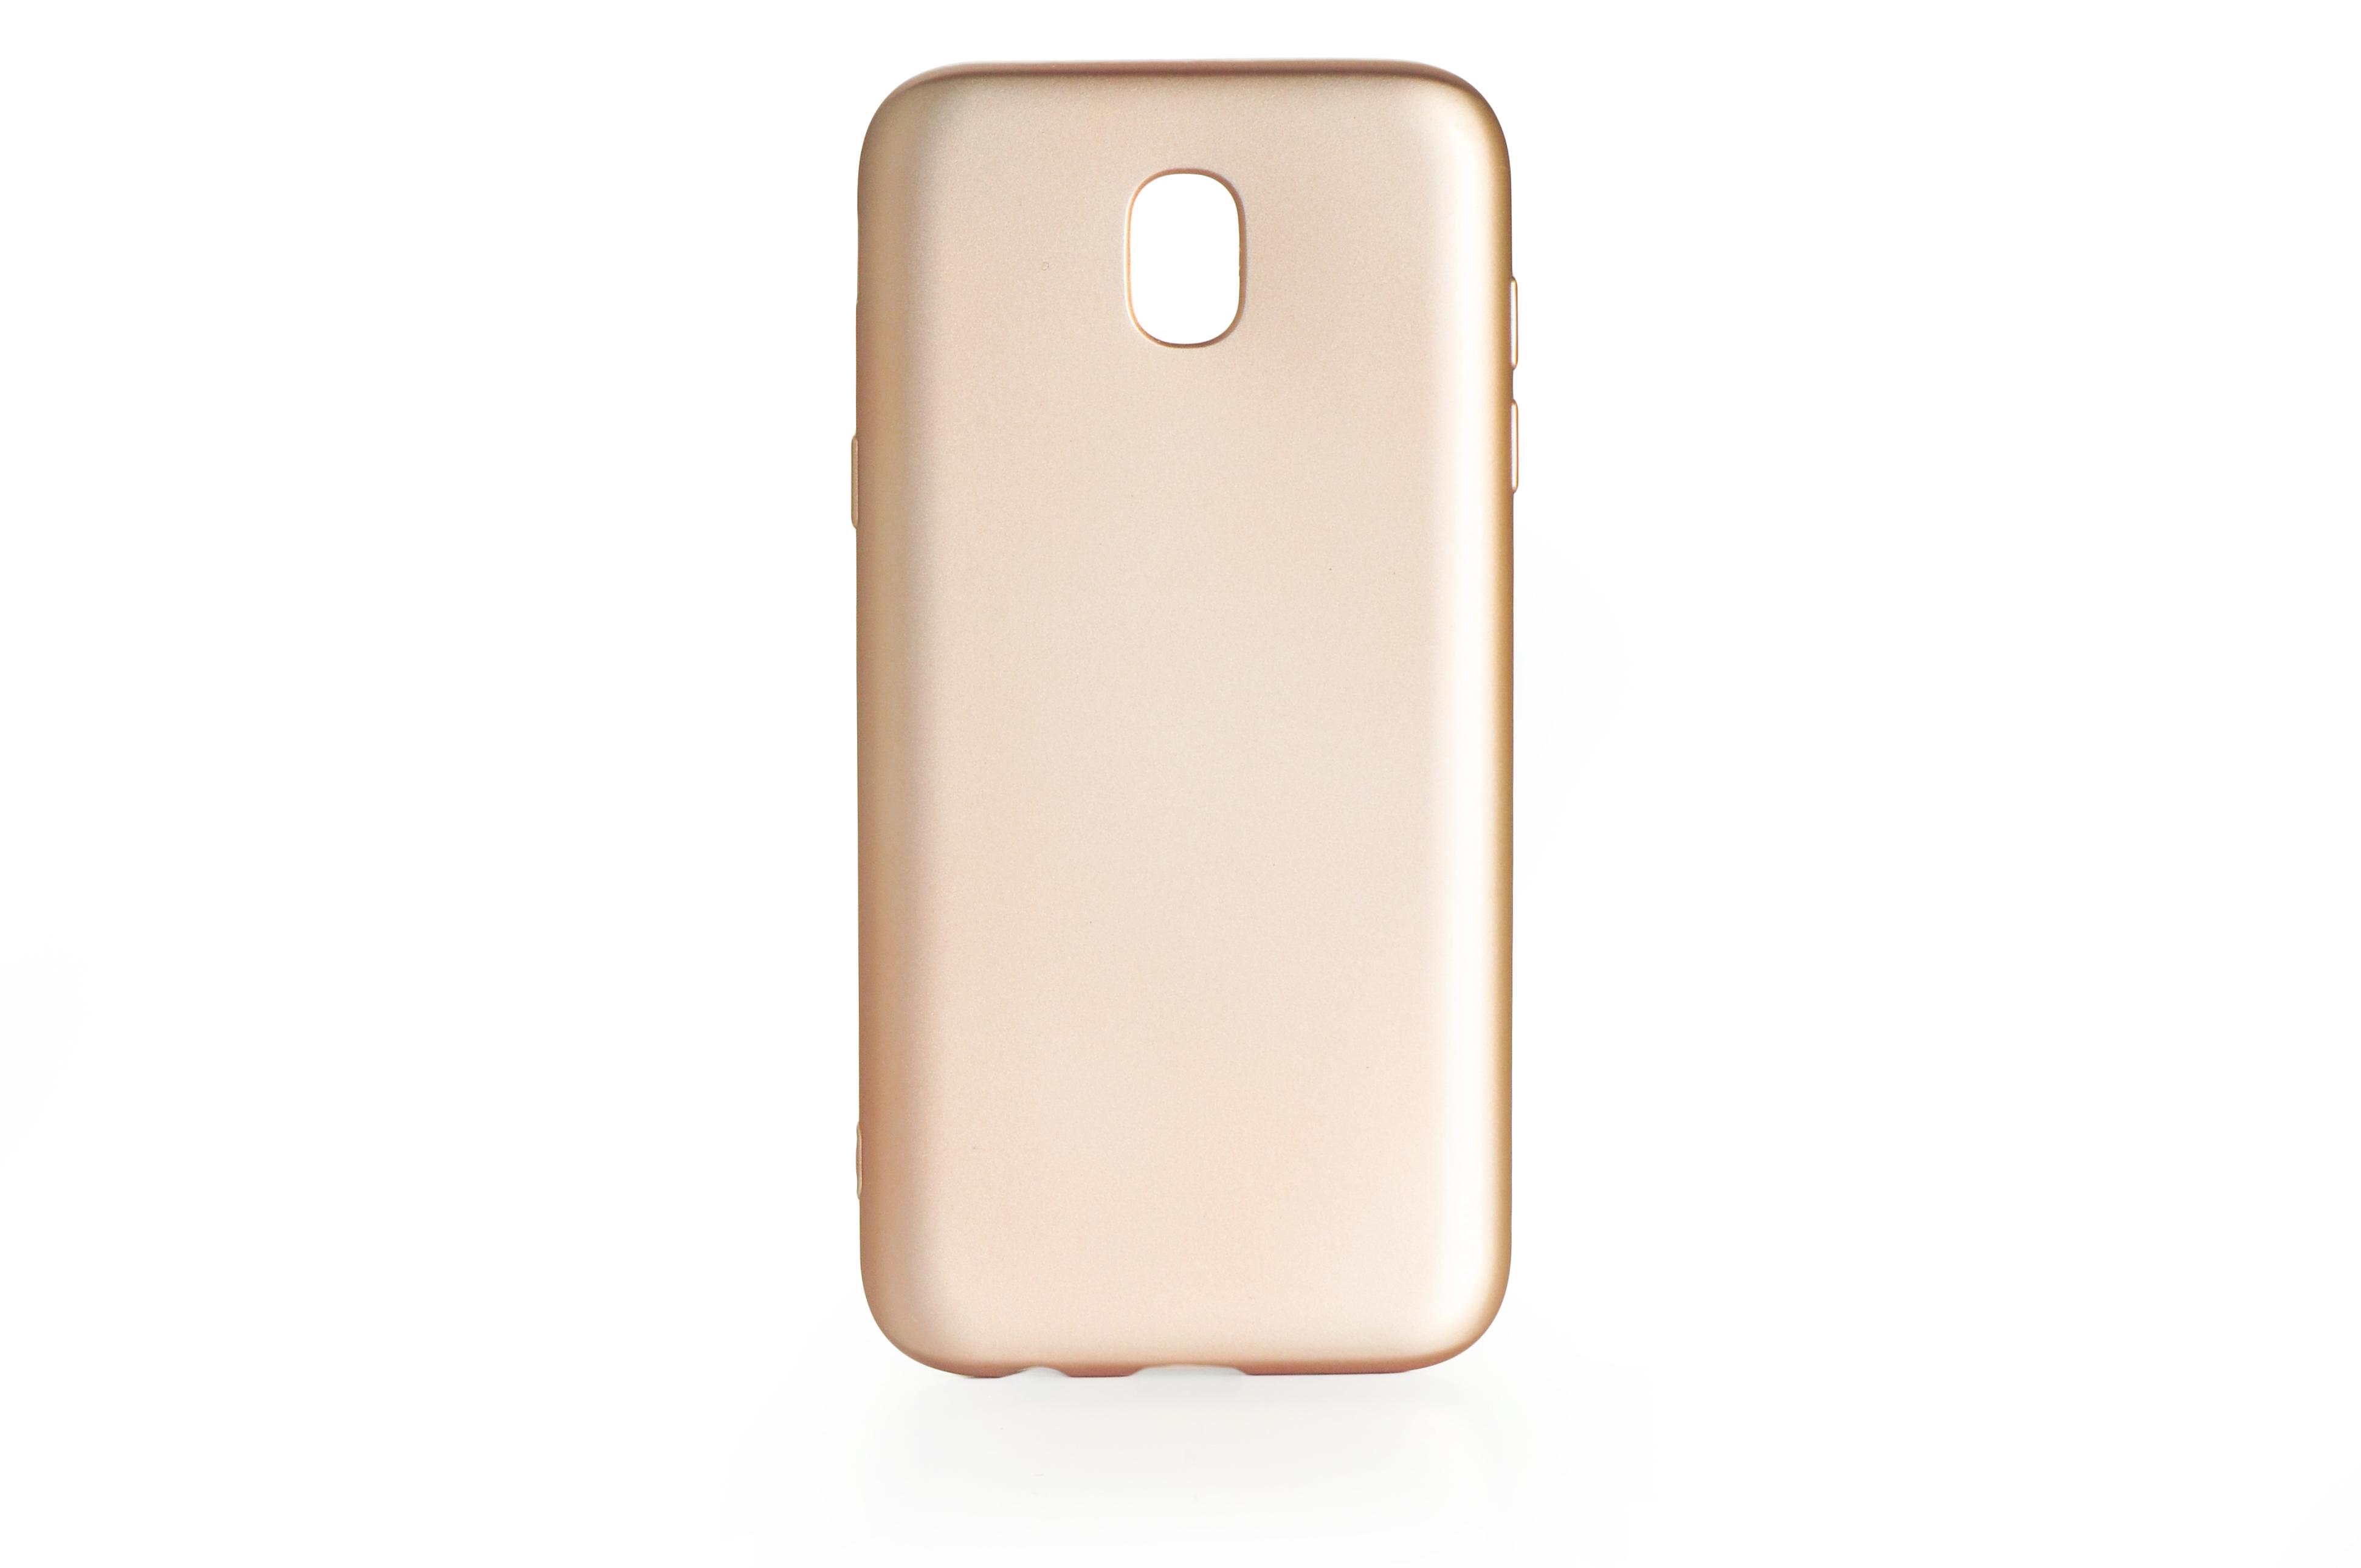 Чехол для сотового телефона Gurdini силикон Soft Touch 904942 для Samsung Galaxy J5 2017 (J 530), золотой